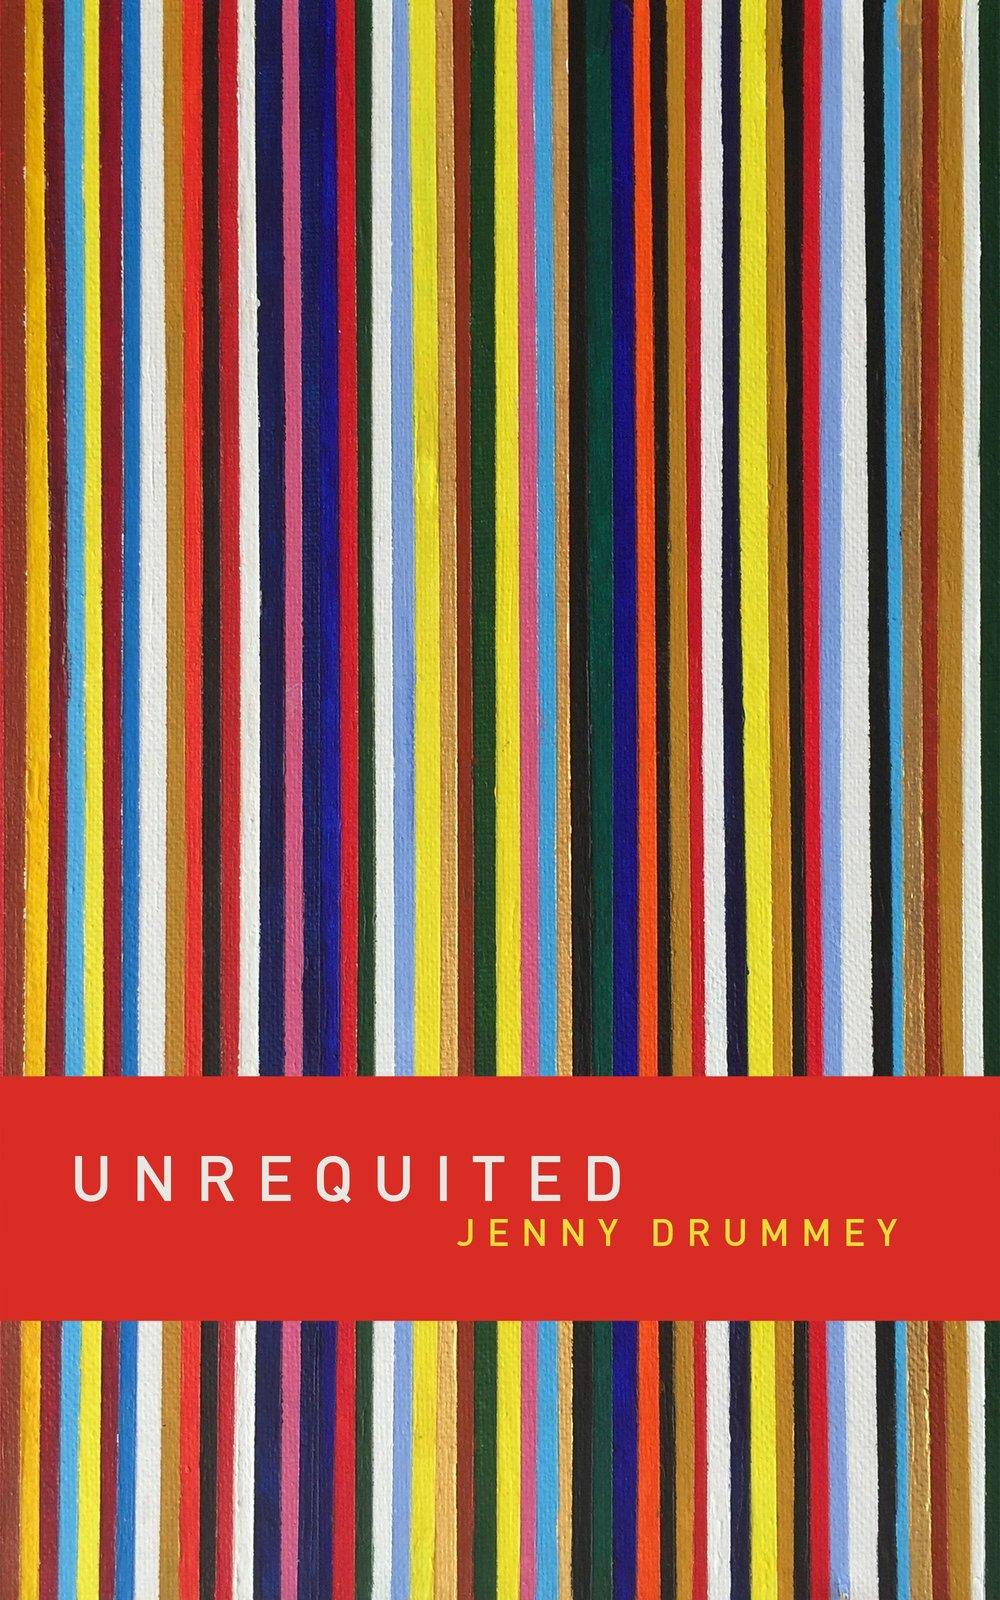 Unrequited, a novel